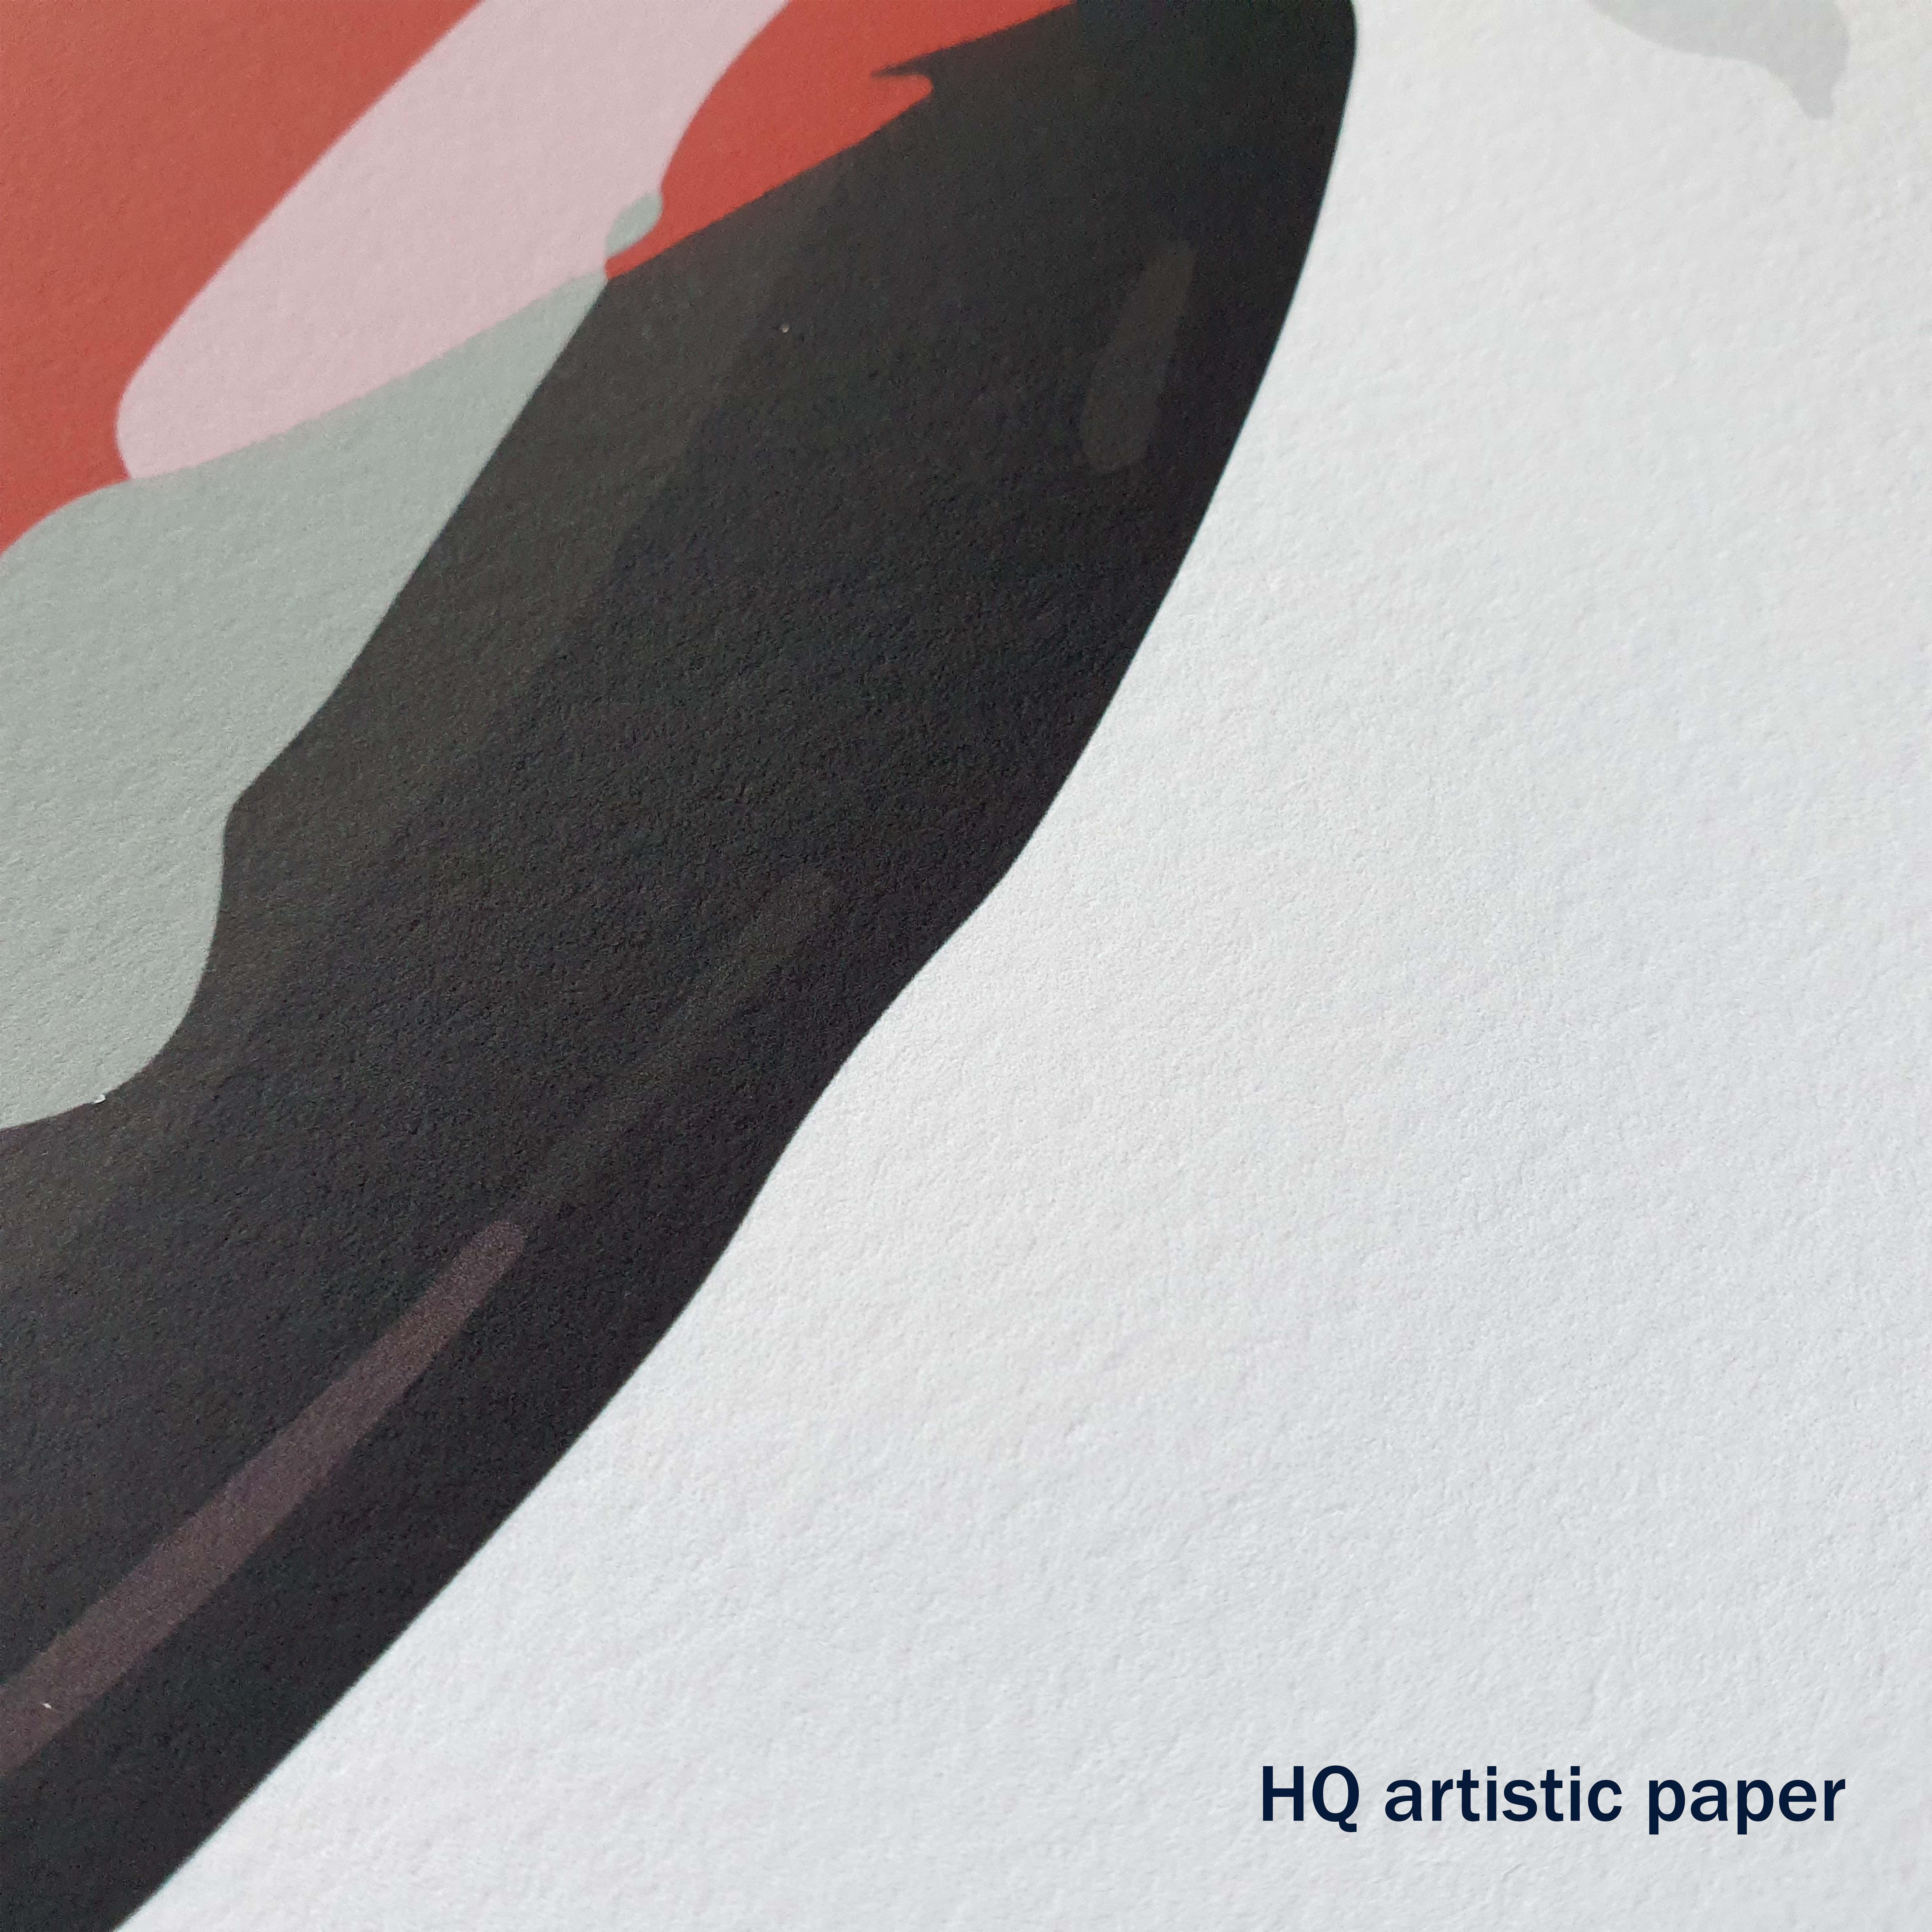 'Eye of the Herring' artprint